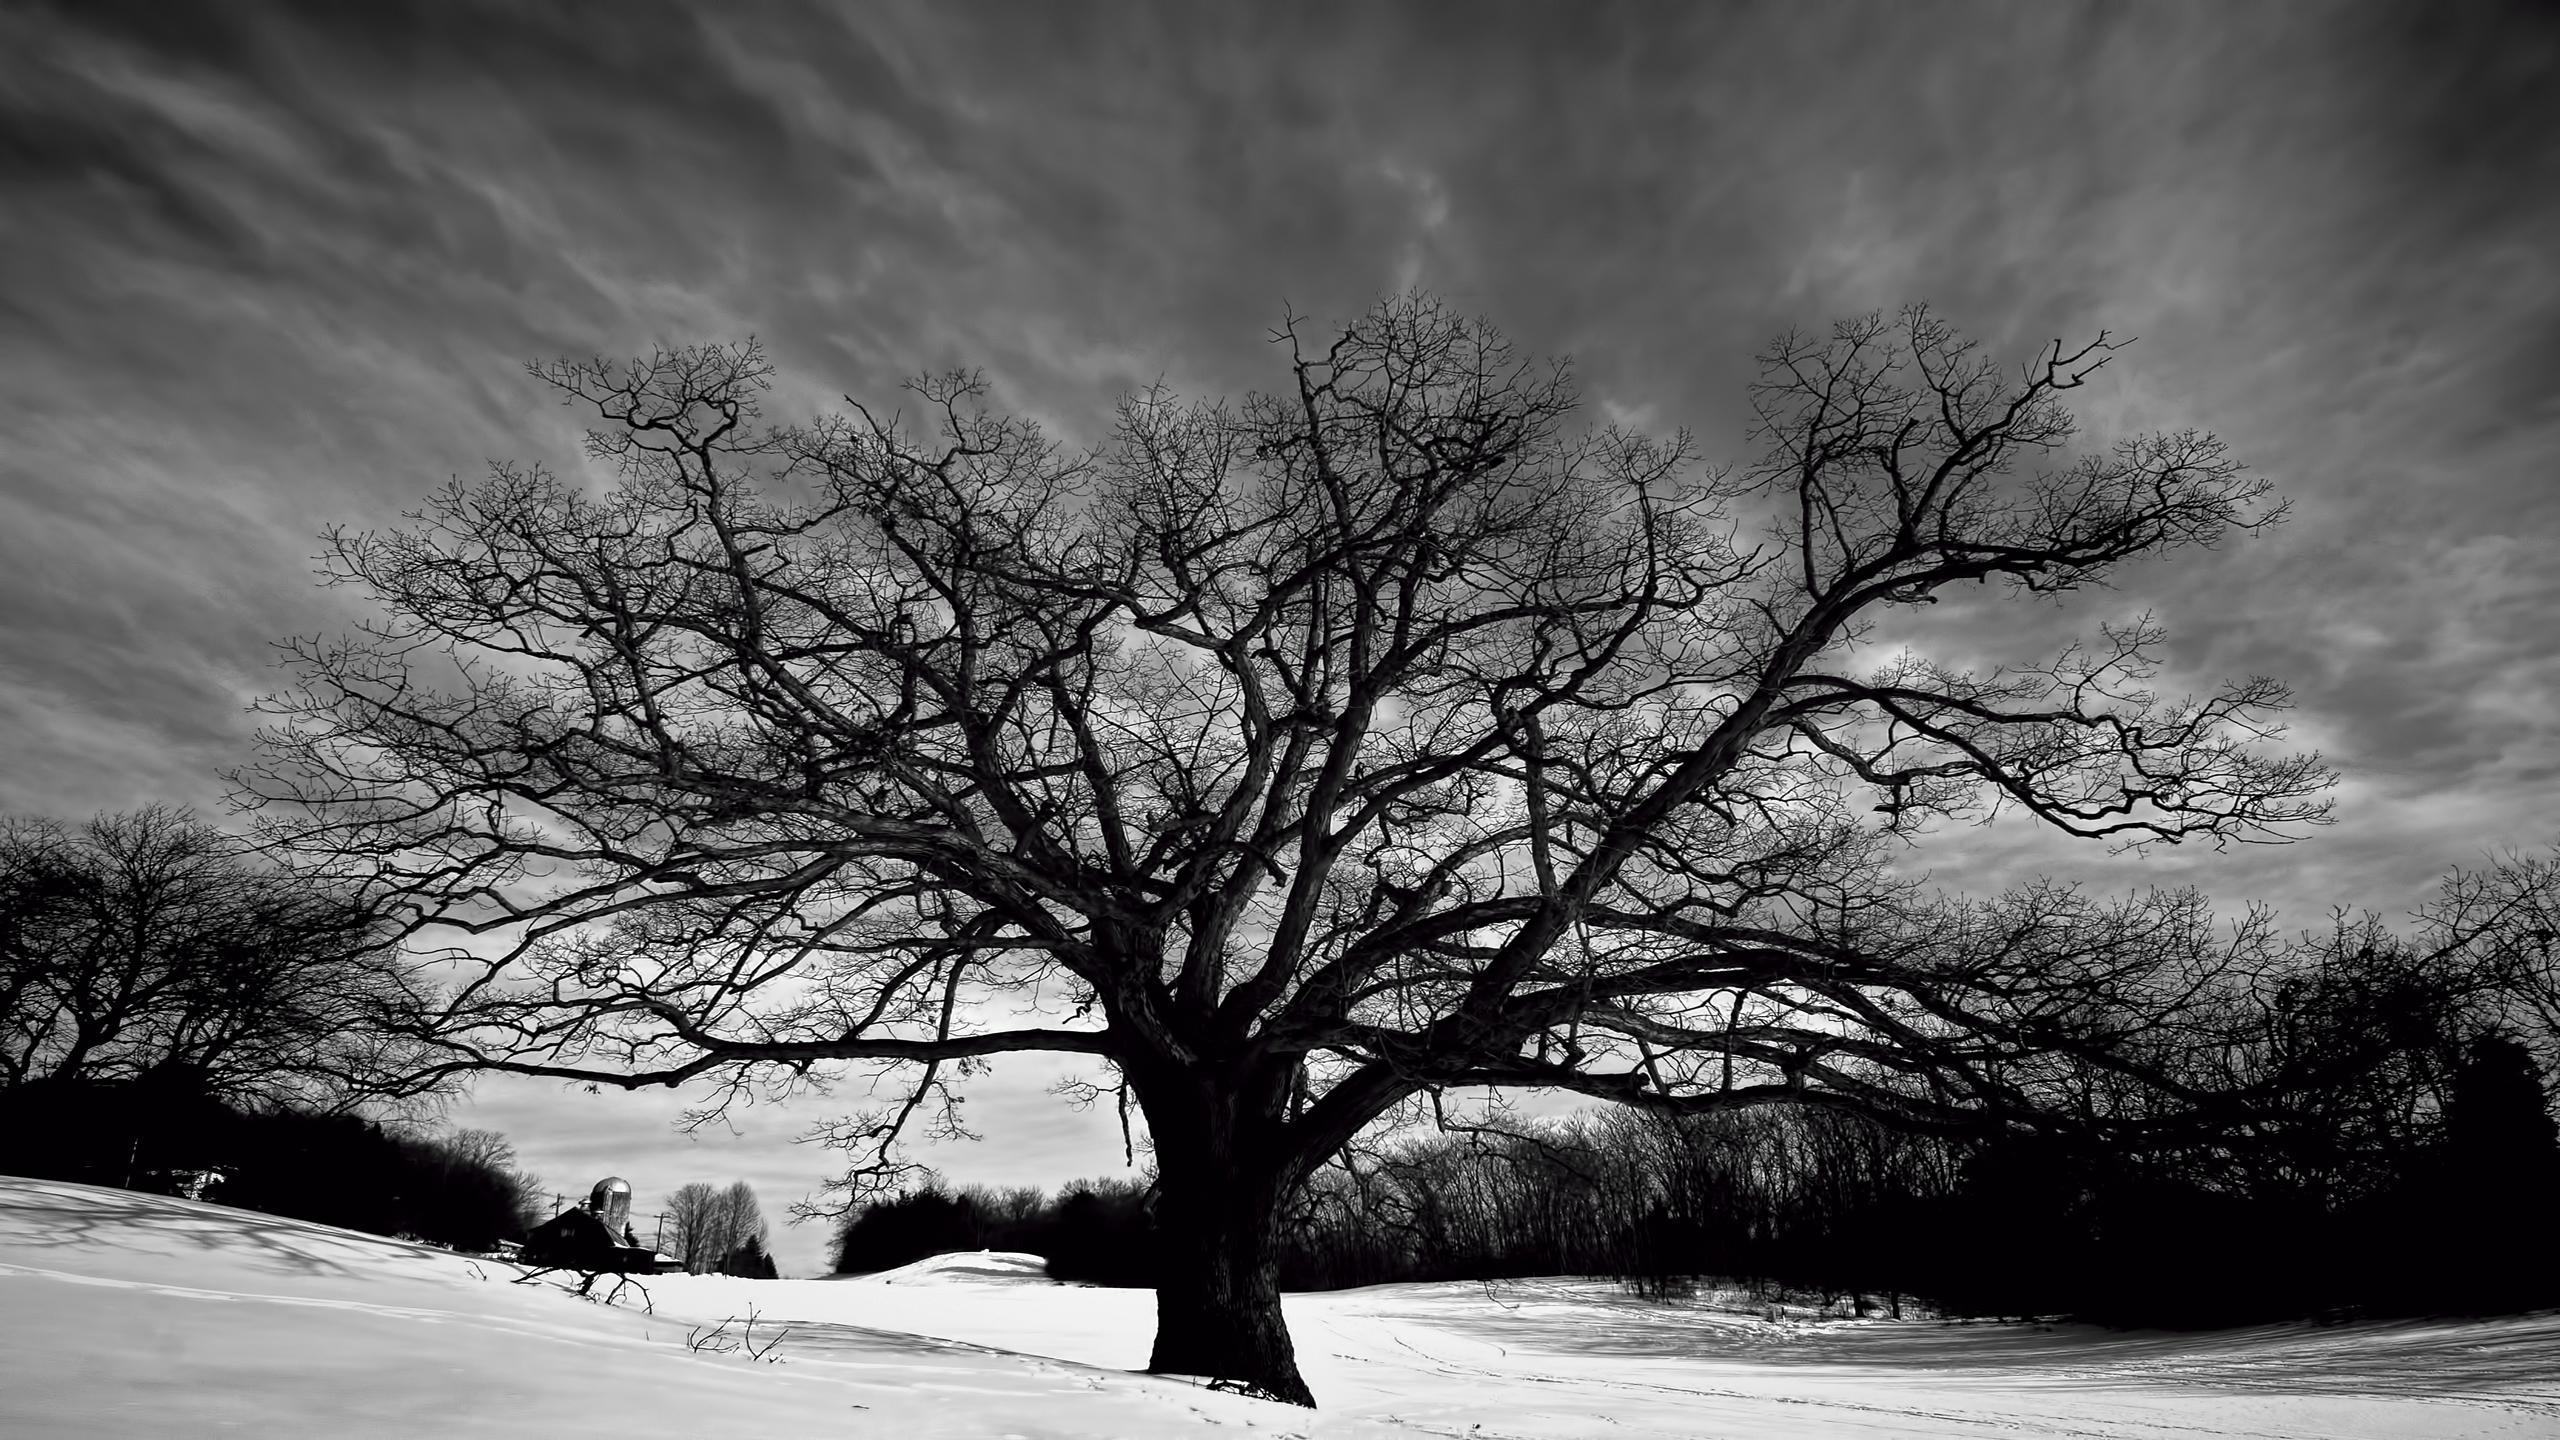 Big Oak Tree Black And White Hd Wallpaper Wallpaper List 2560x1440